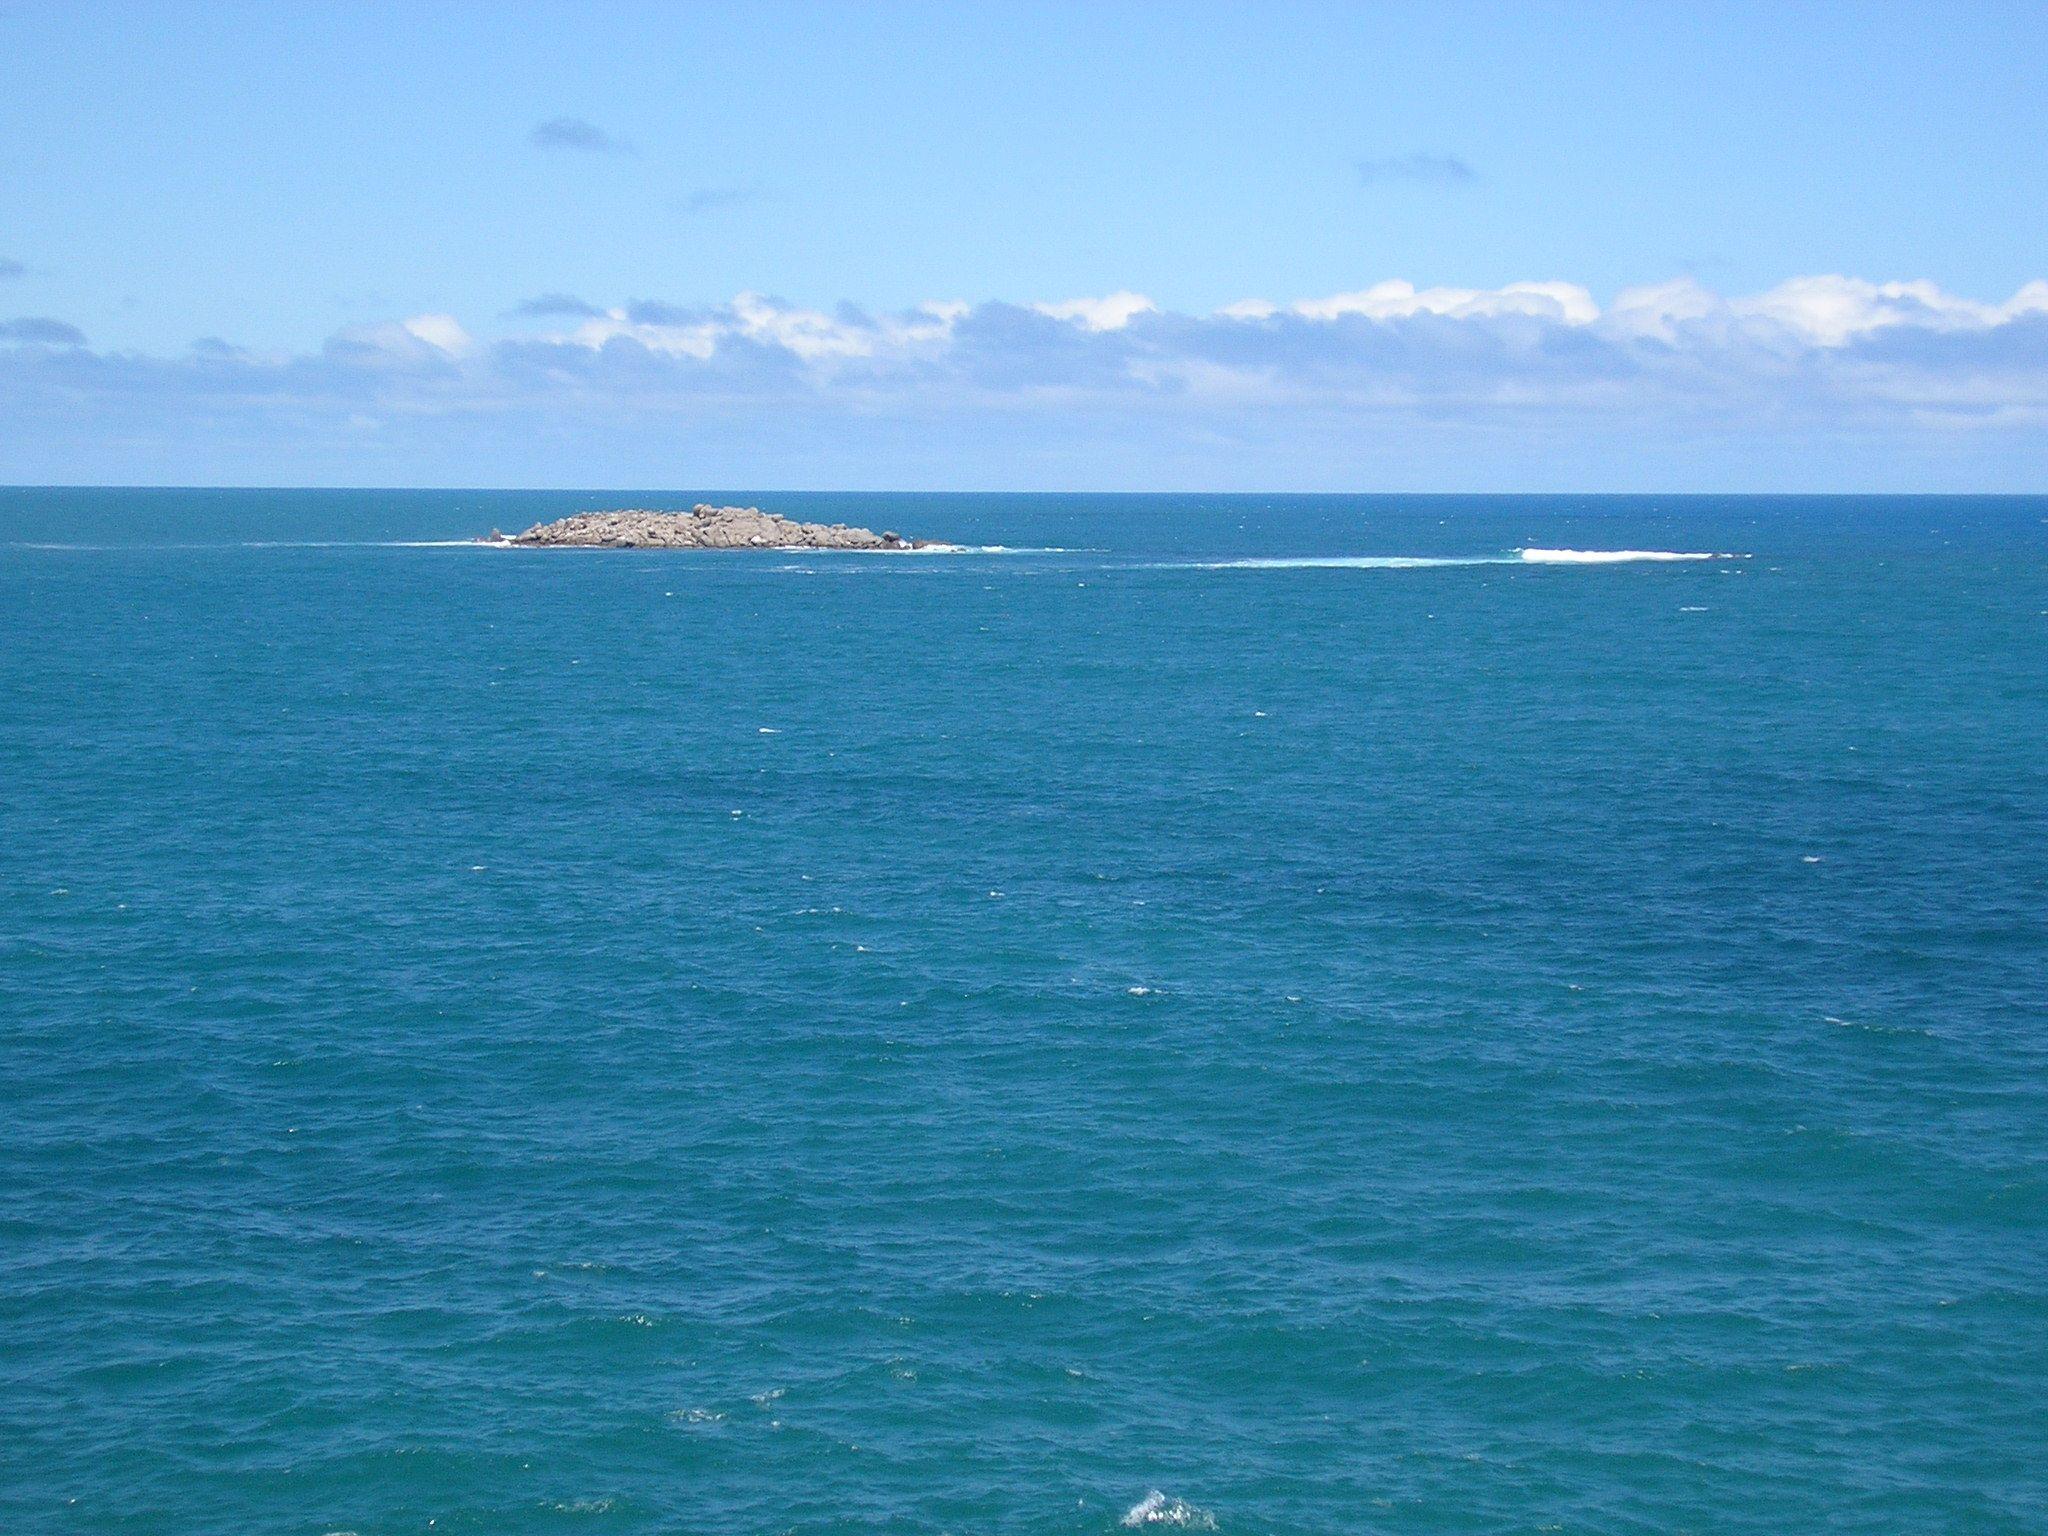 Seal Island from Granite Island, South Australia.